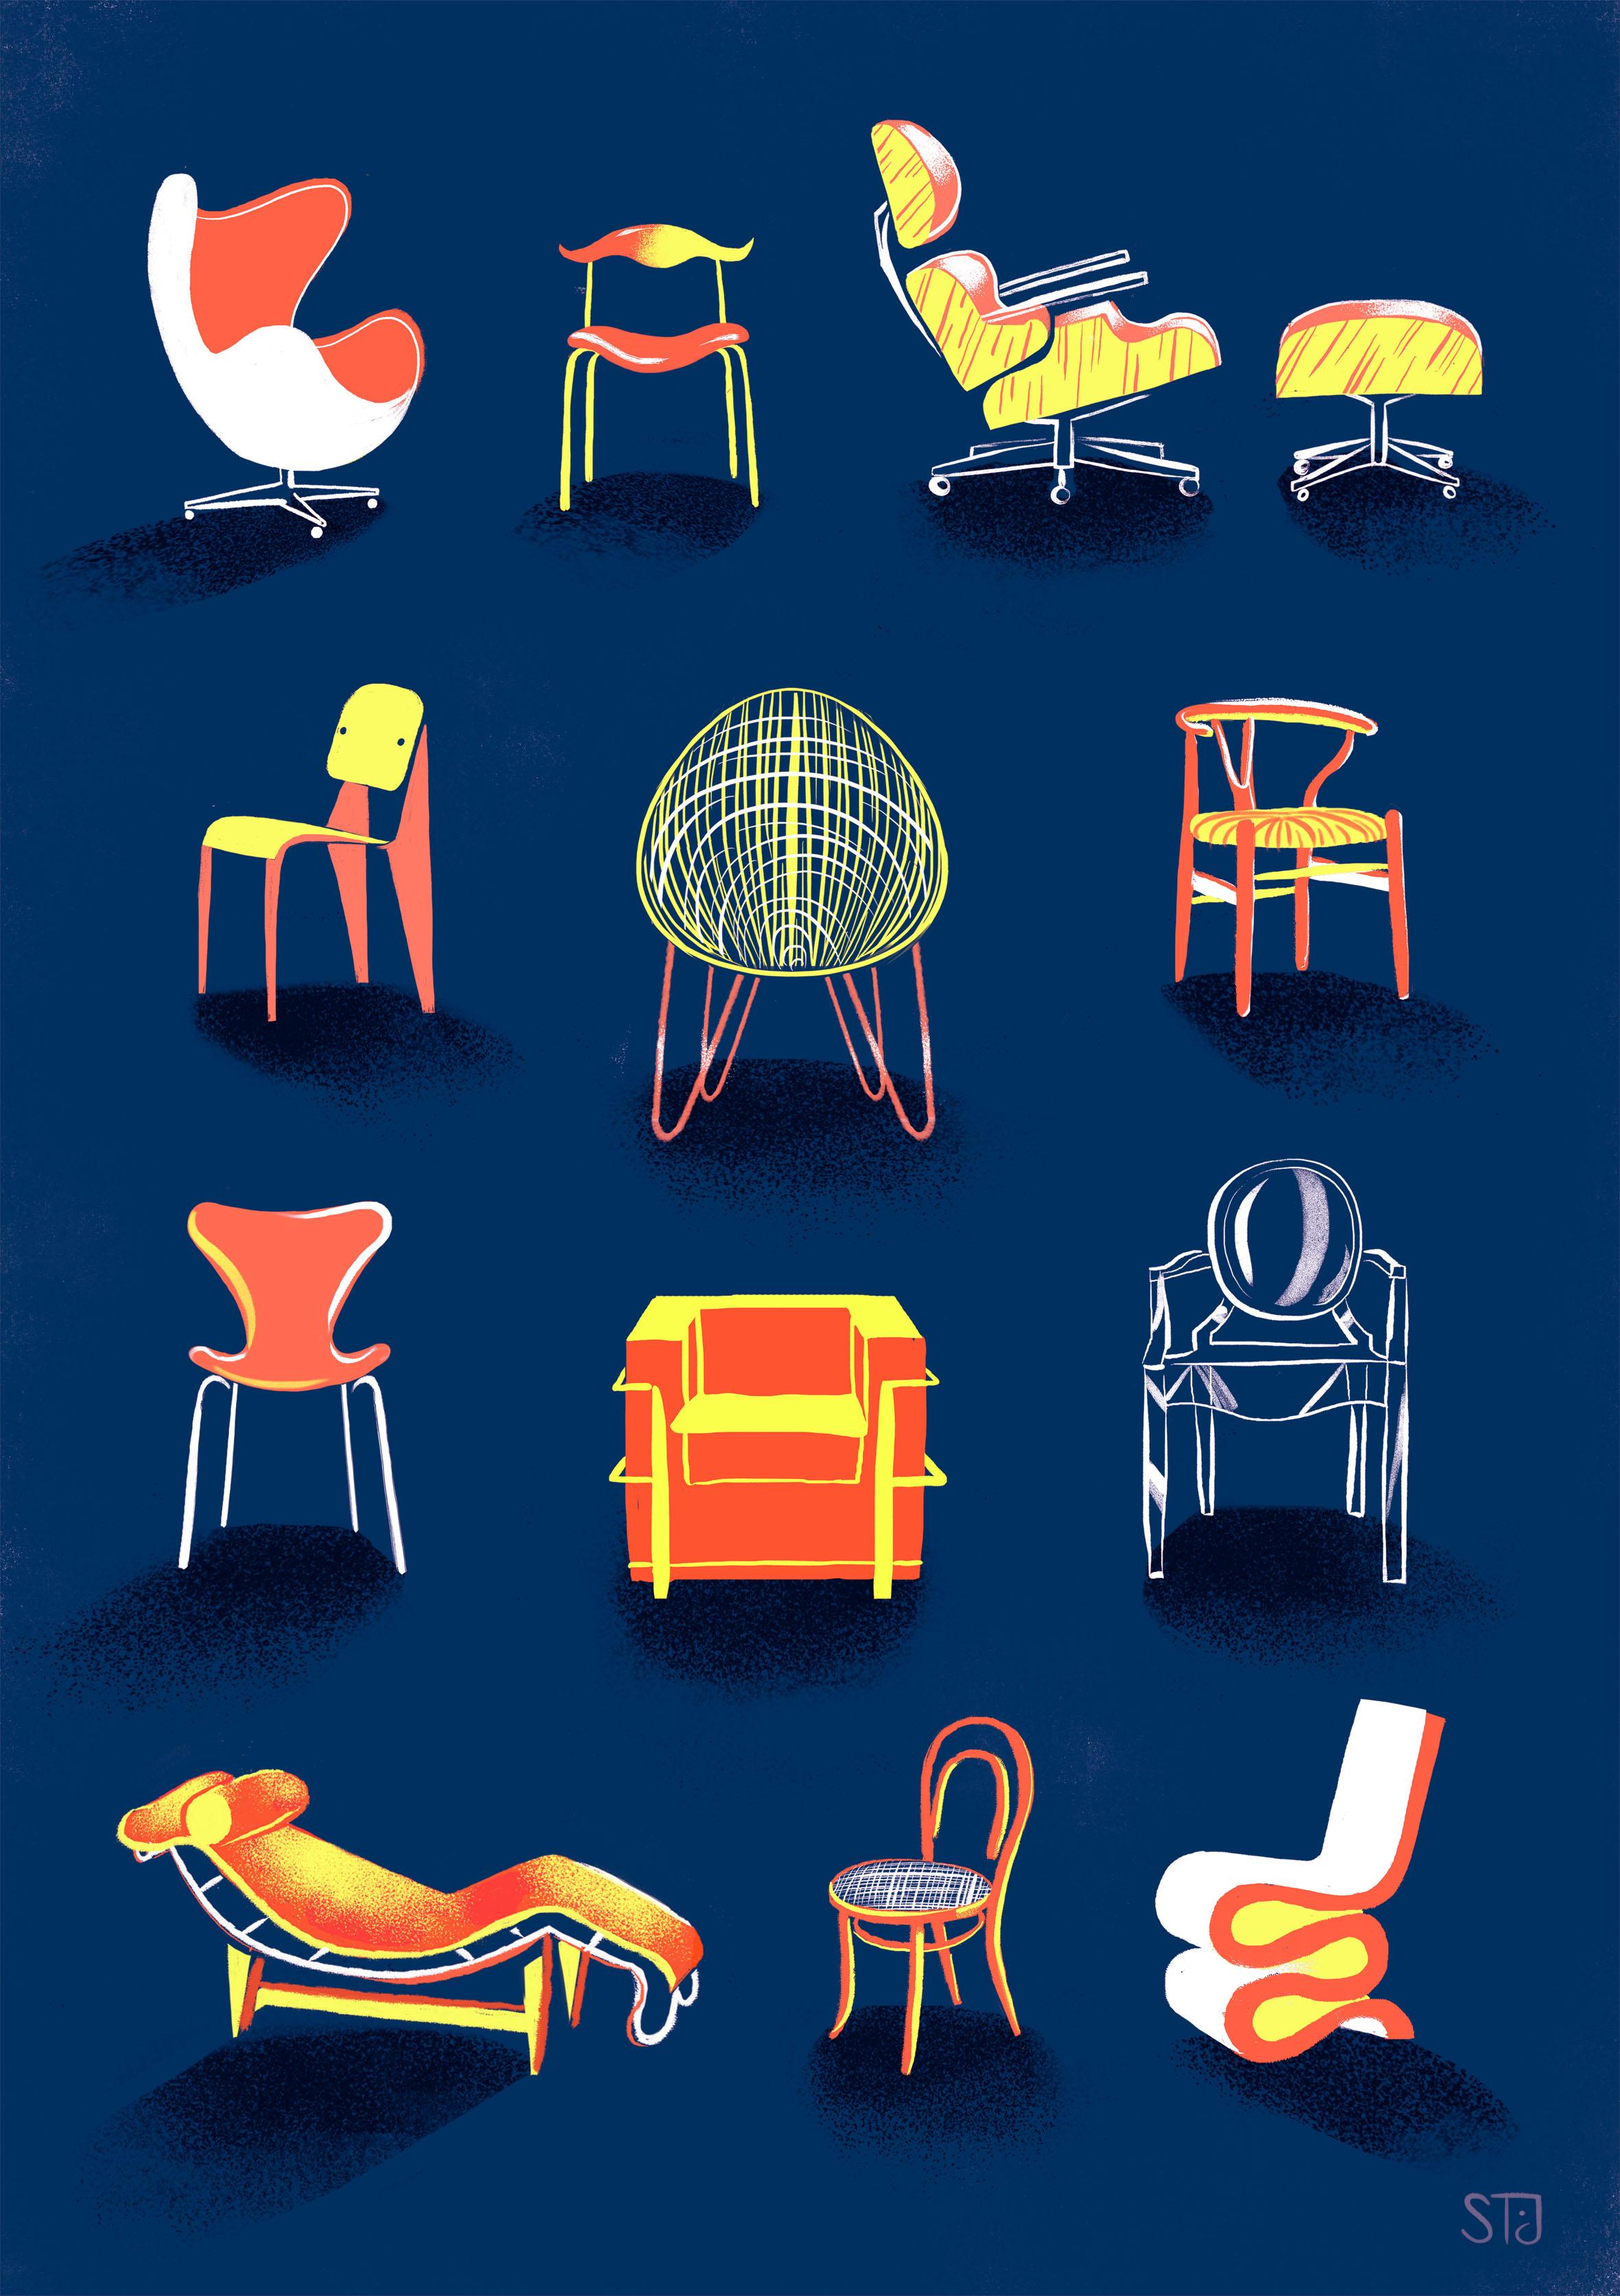 sarahtanatjones-chairs-final.jpg